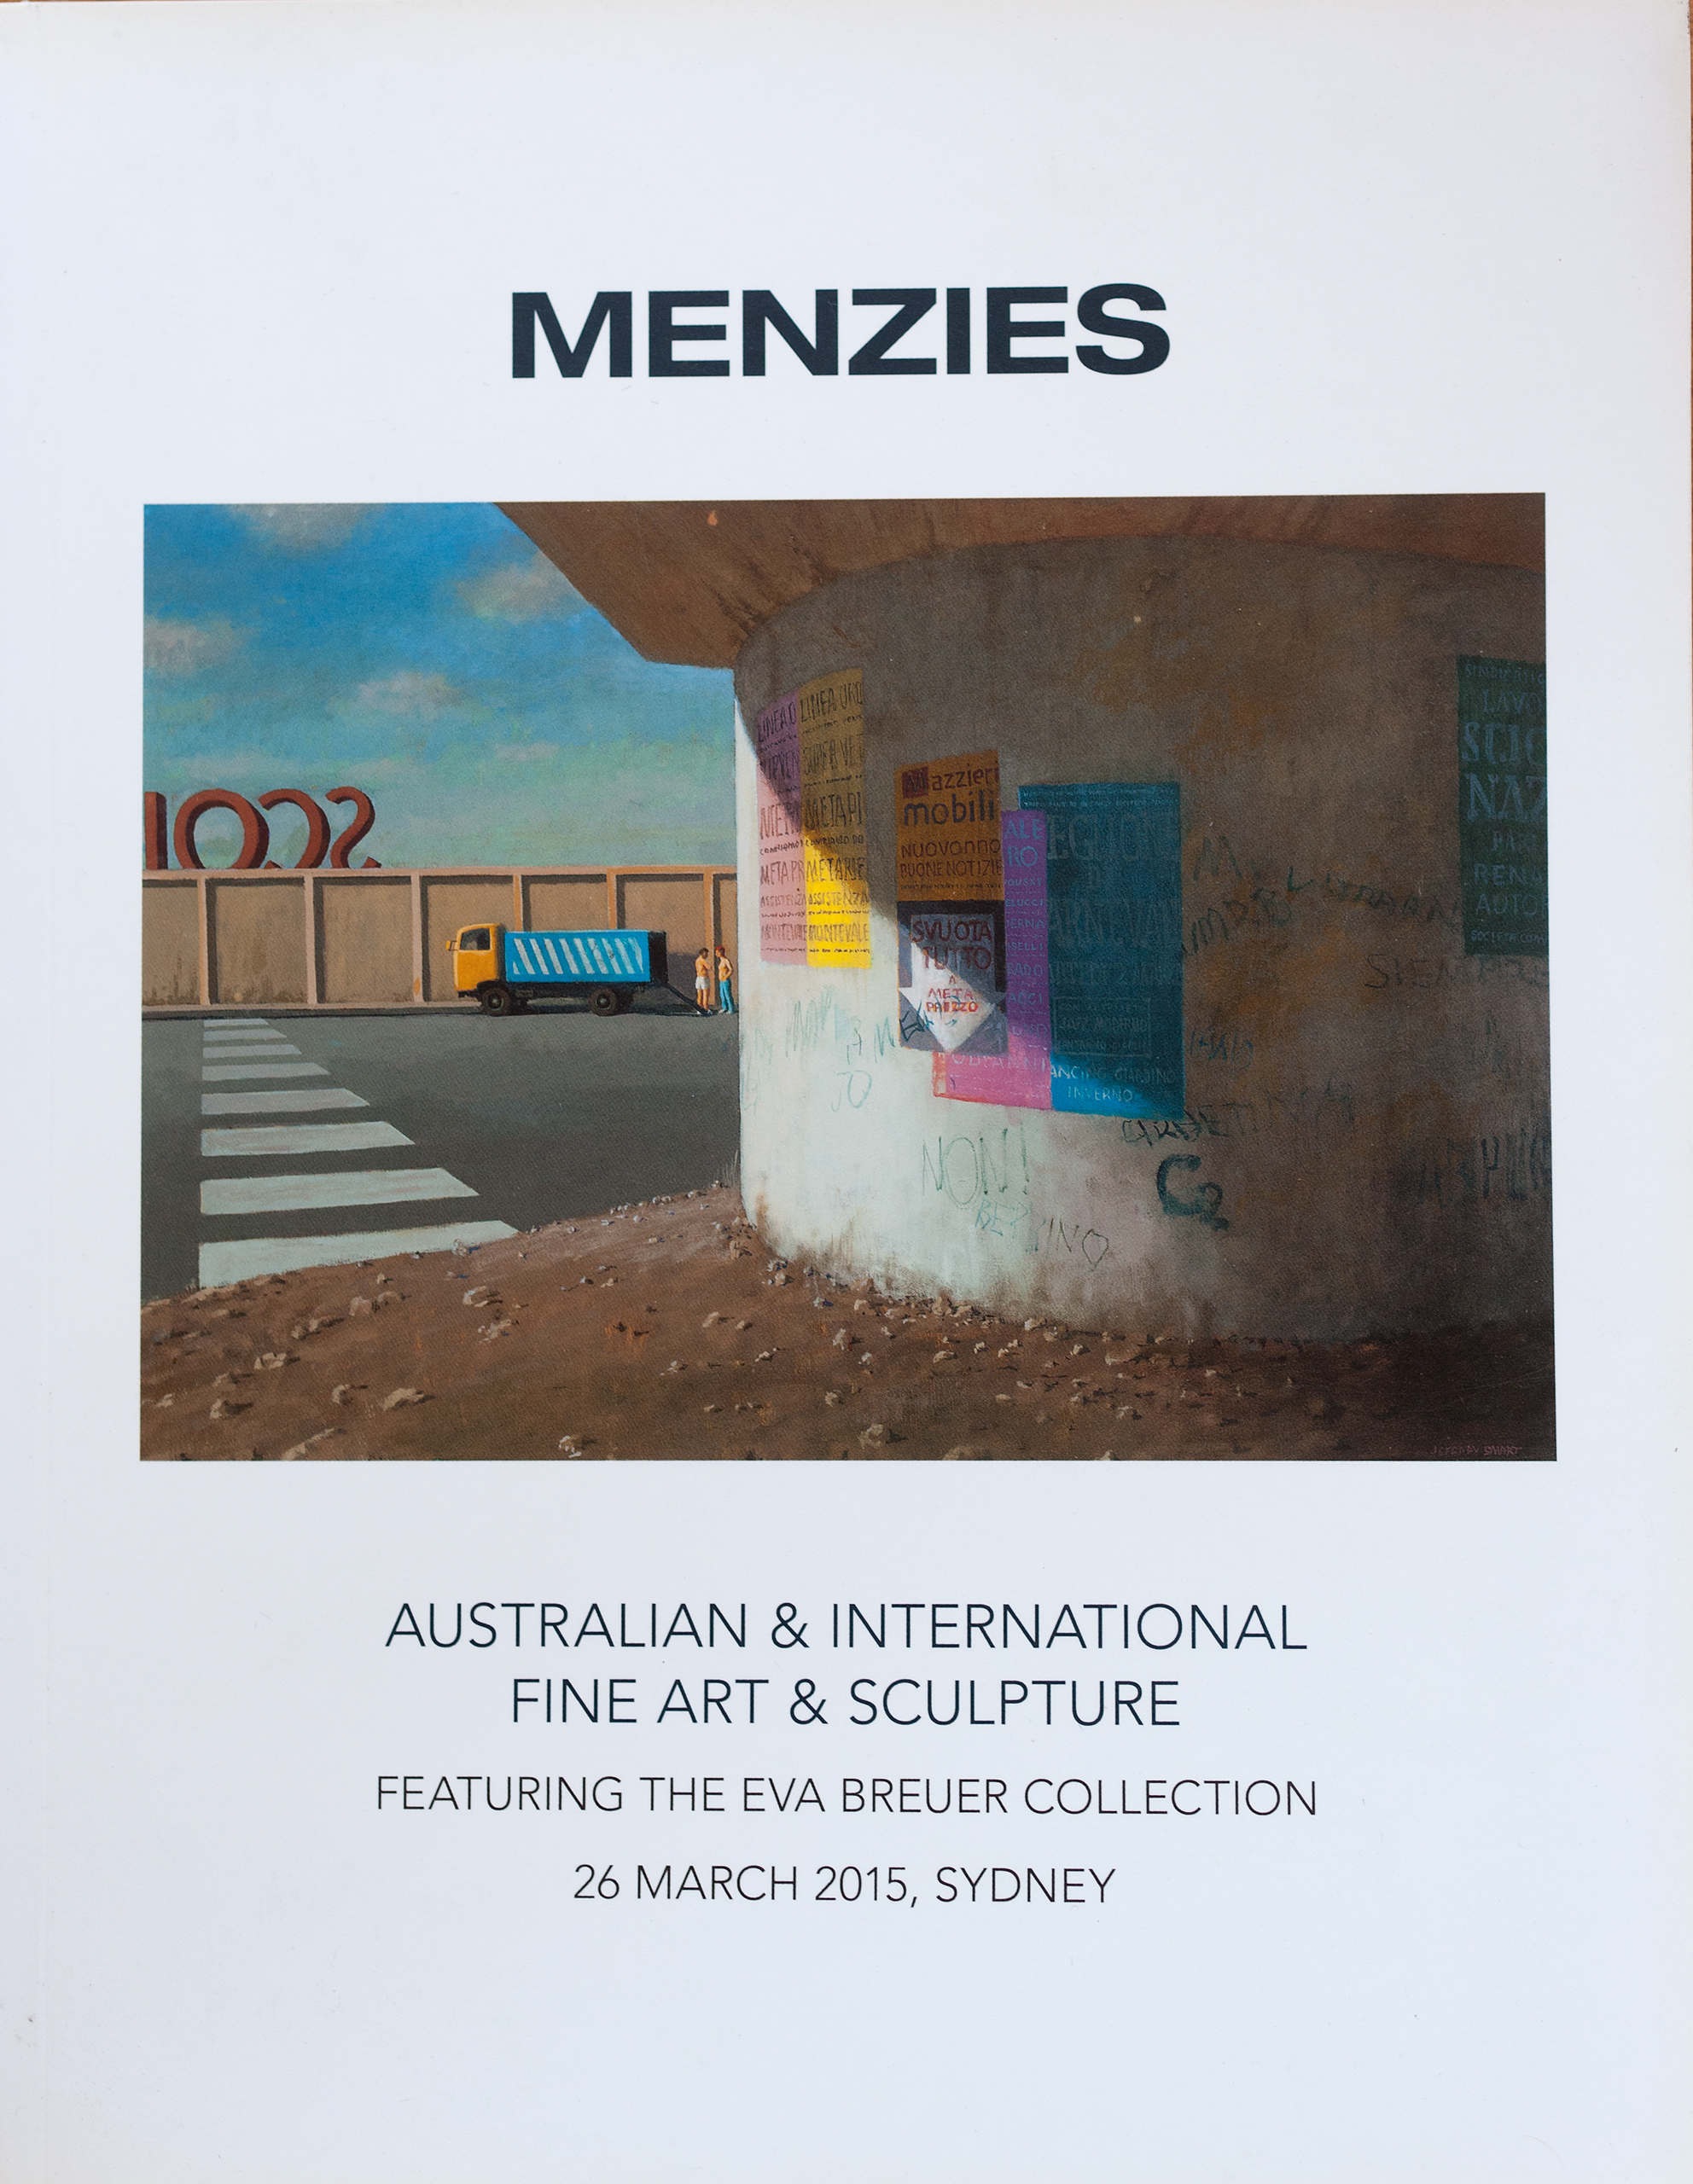 171023 Menzies Catalogues_017.jpg